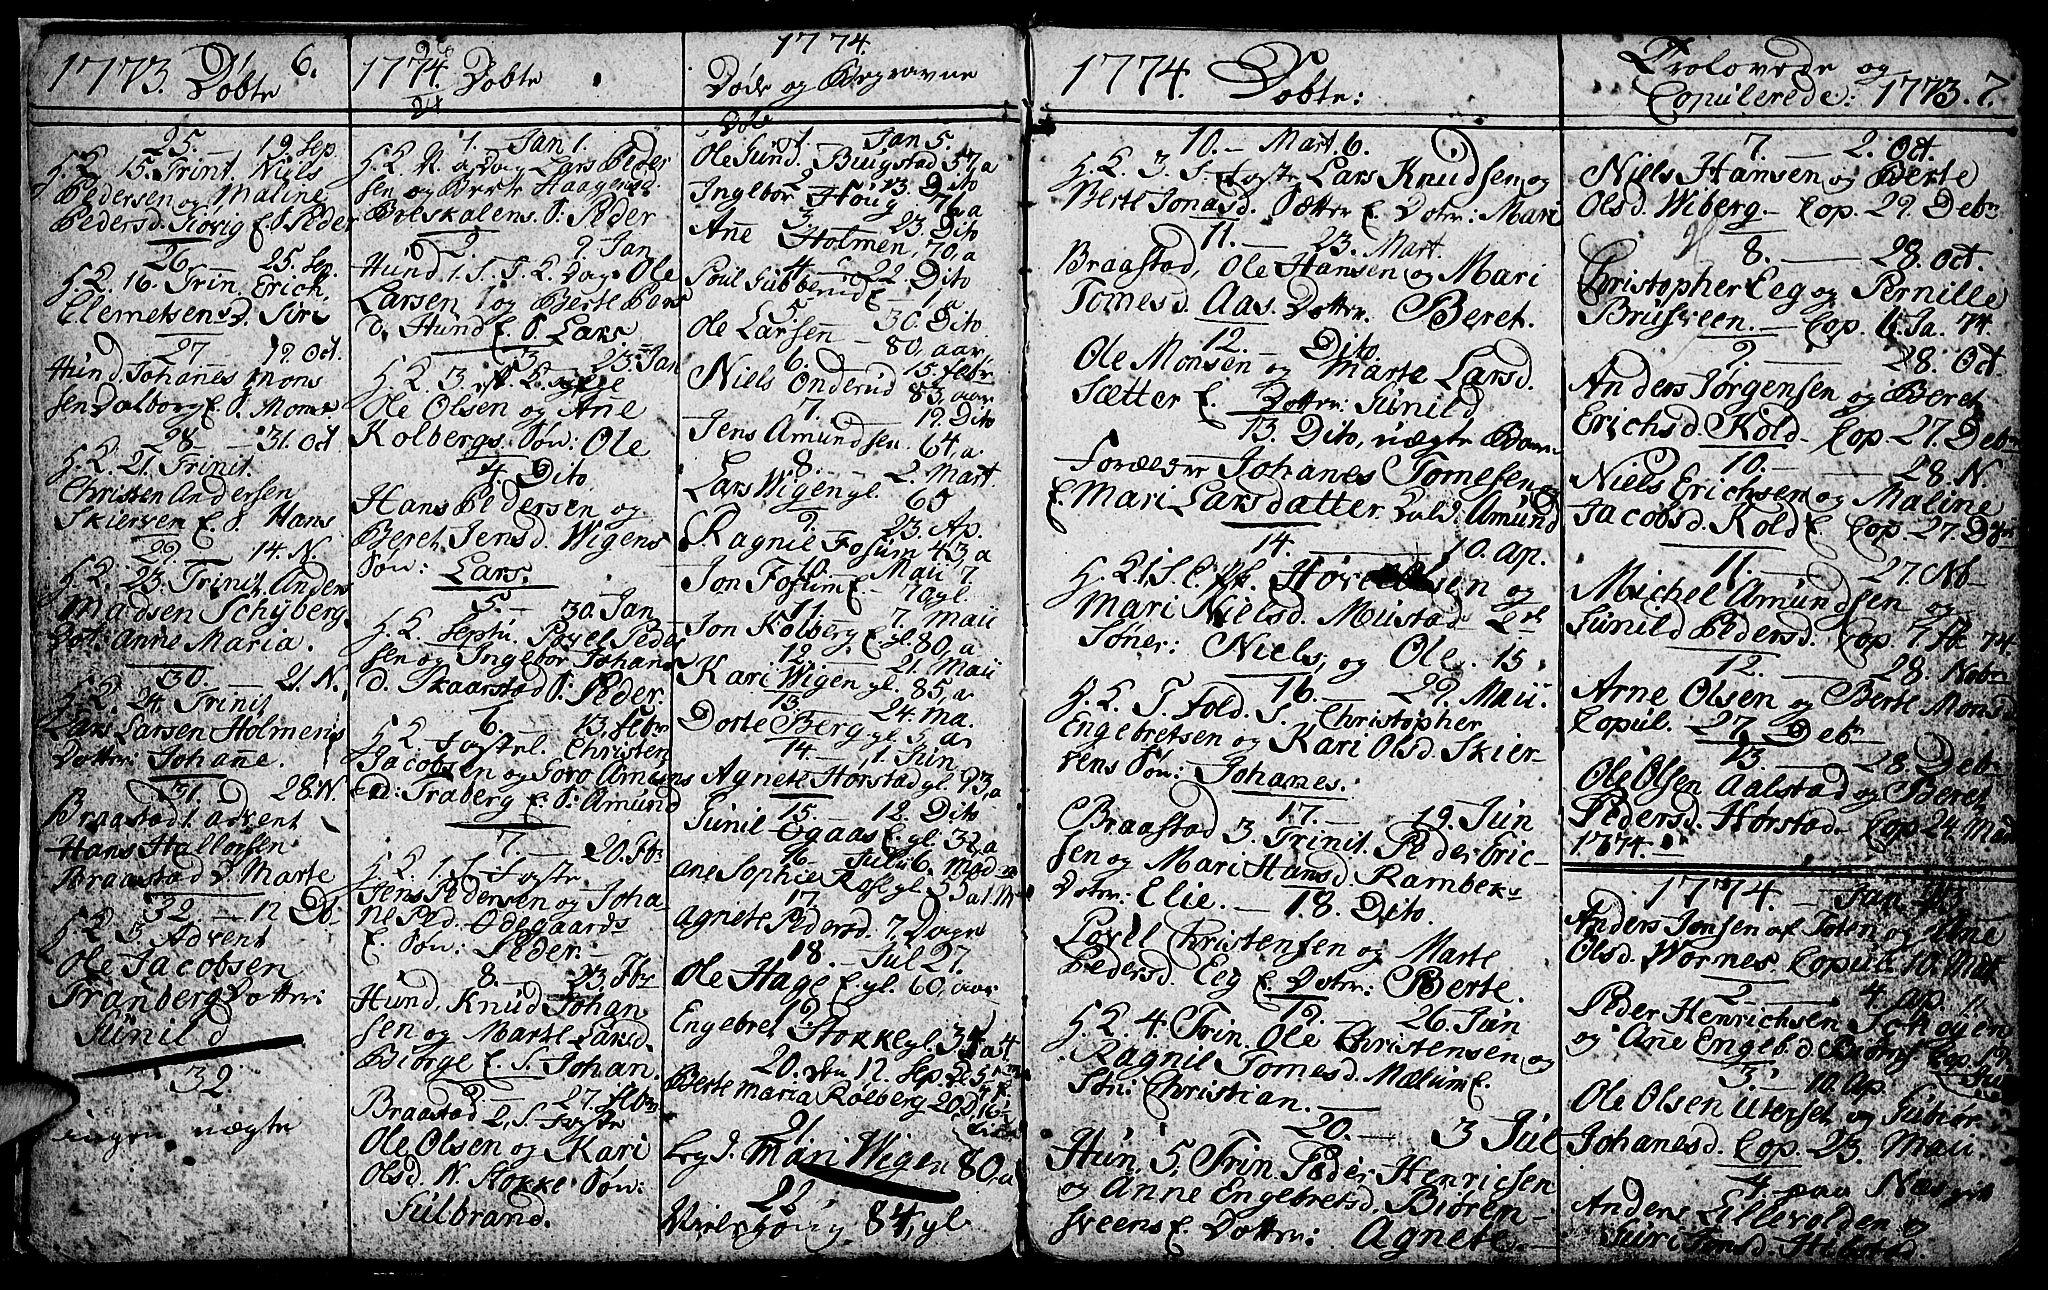 SAH, Vardal prestekontor, H/Ha/Hab/L0001: Klokkerbok nr. 1, 1771-1790, s. 6-7